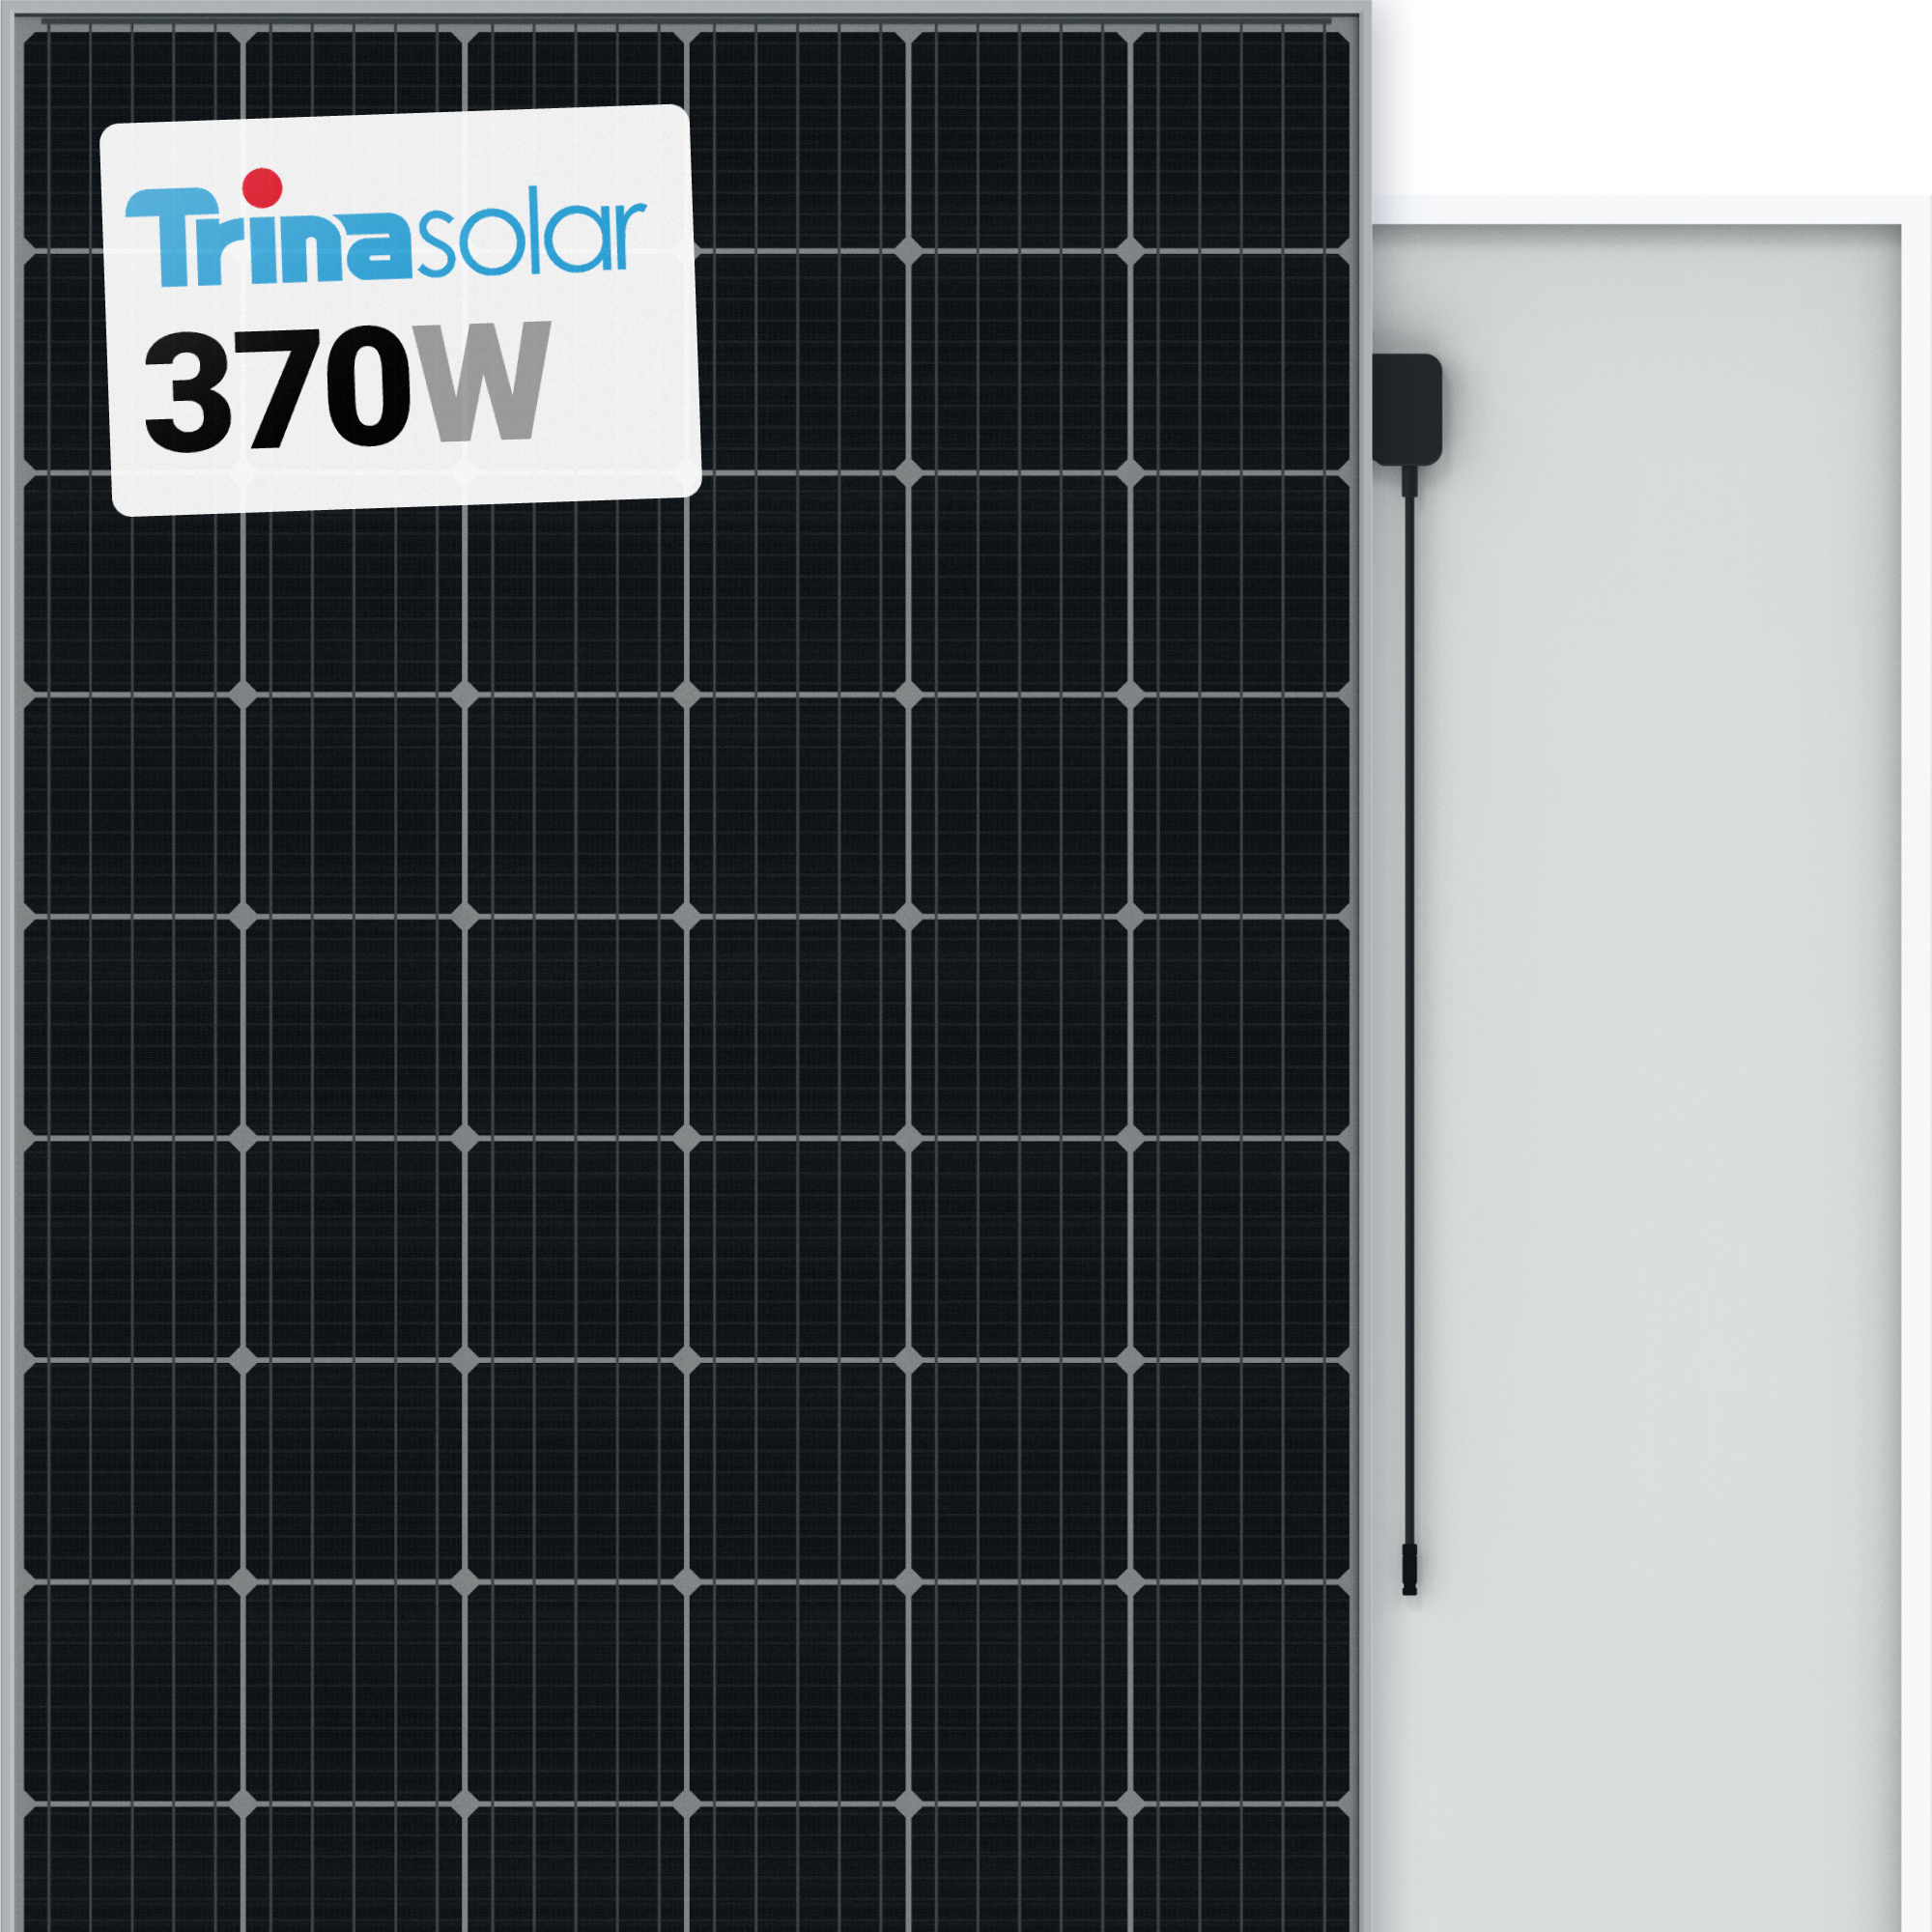 Trina 370w Solar Panel 72 Cell Tsm 370 De14a Ll Monocrystalline Black A1 Solar Store